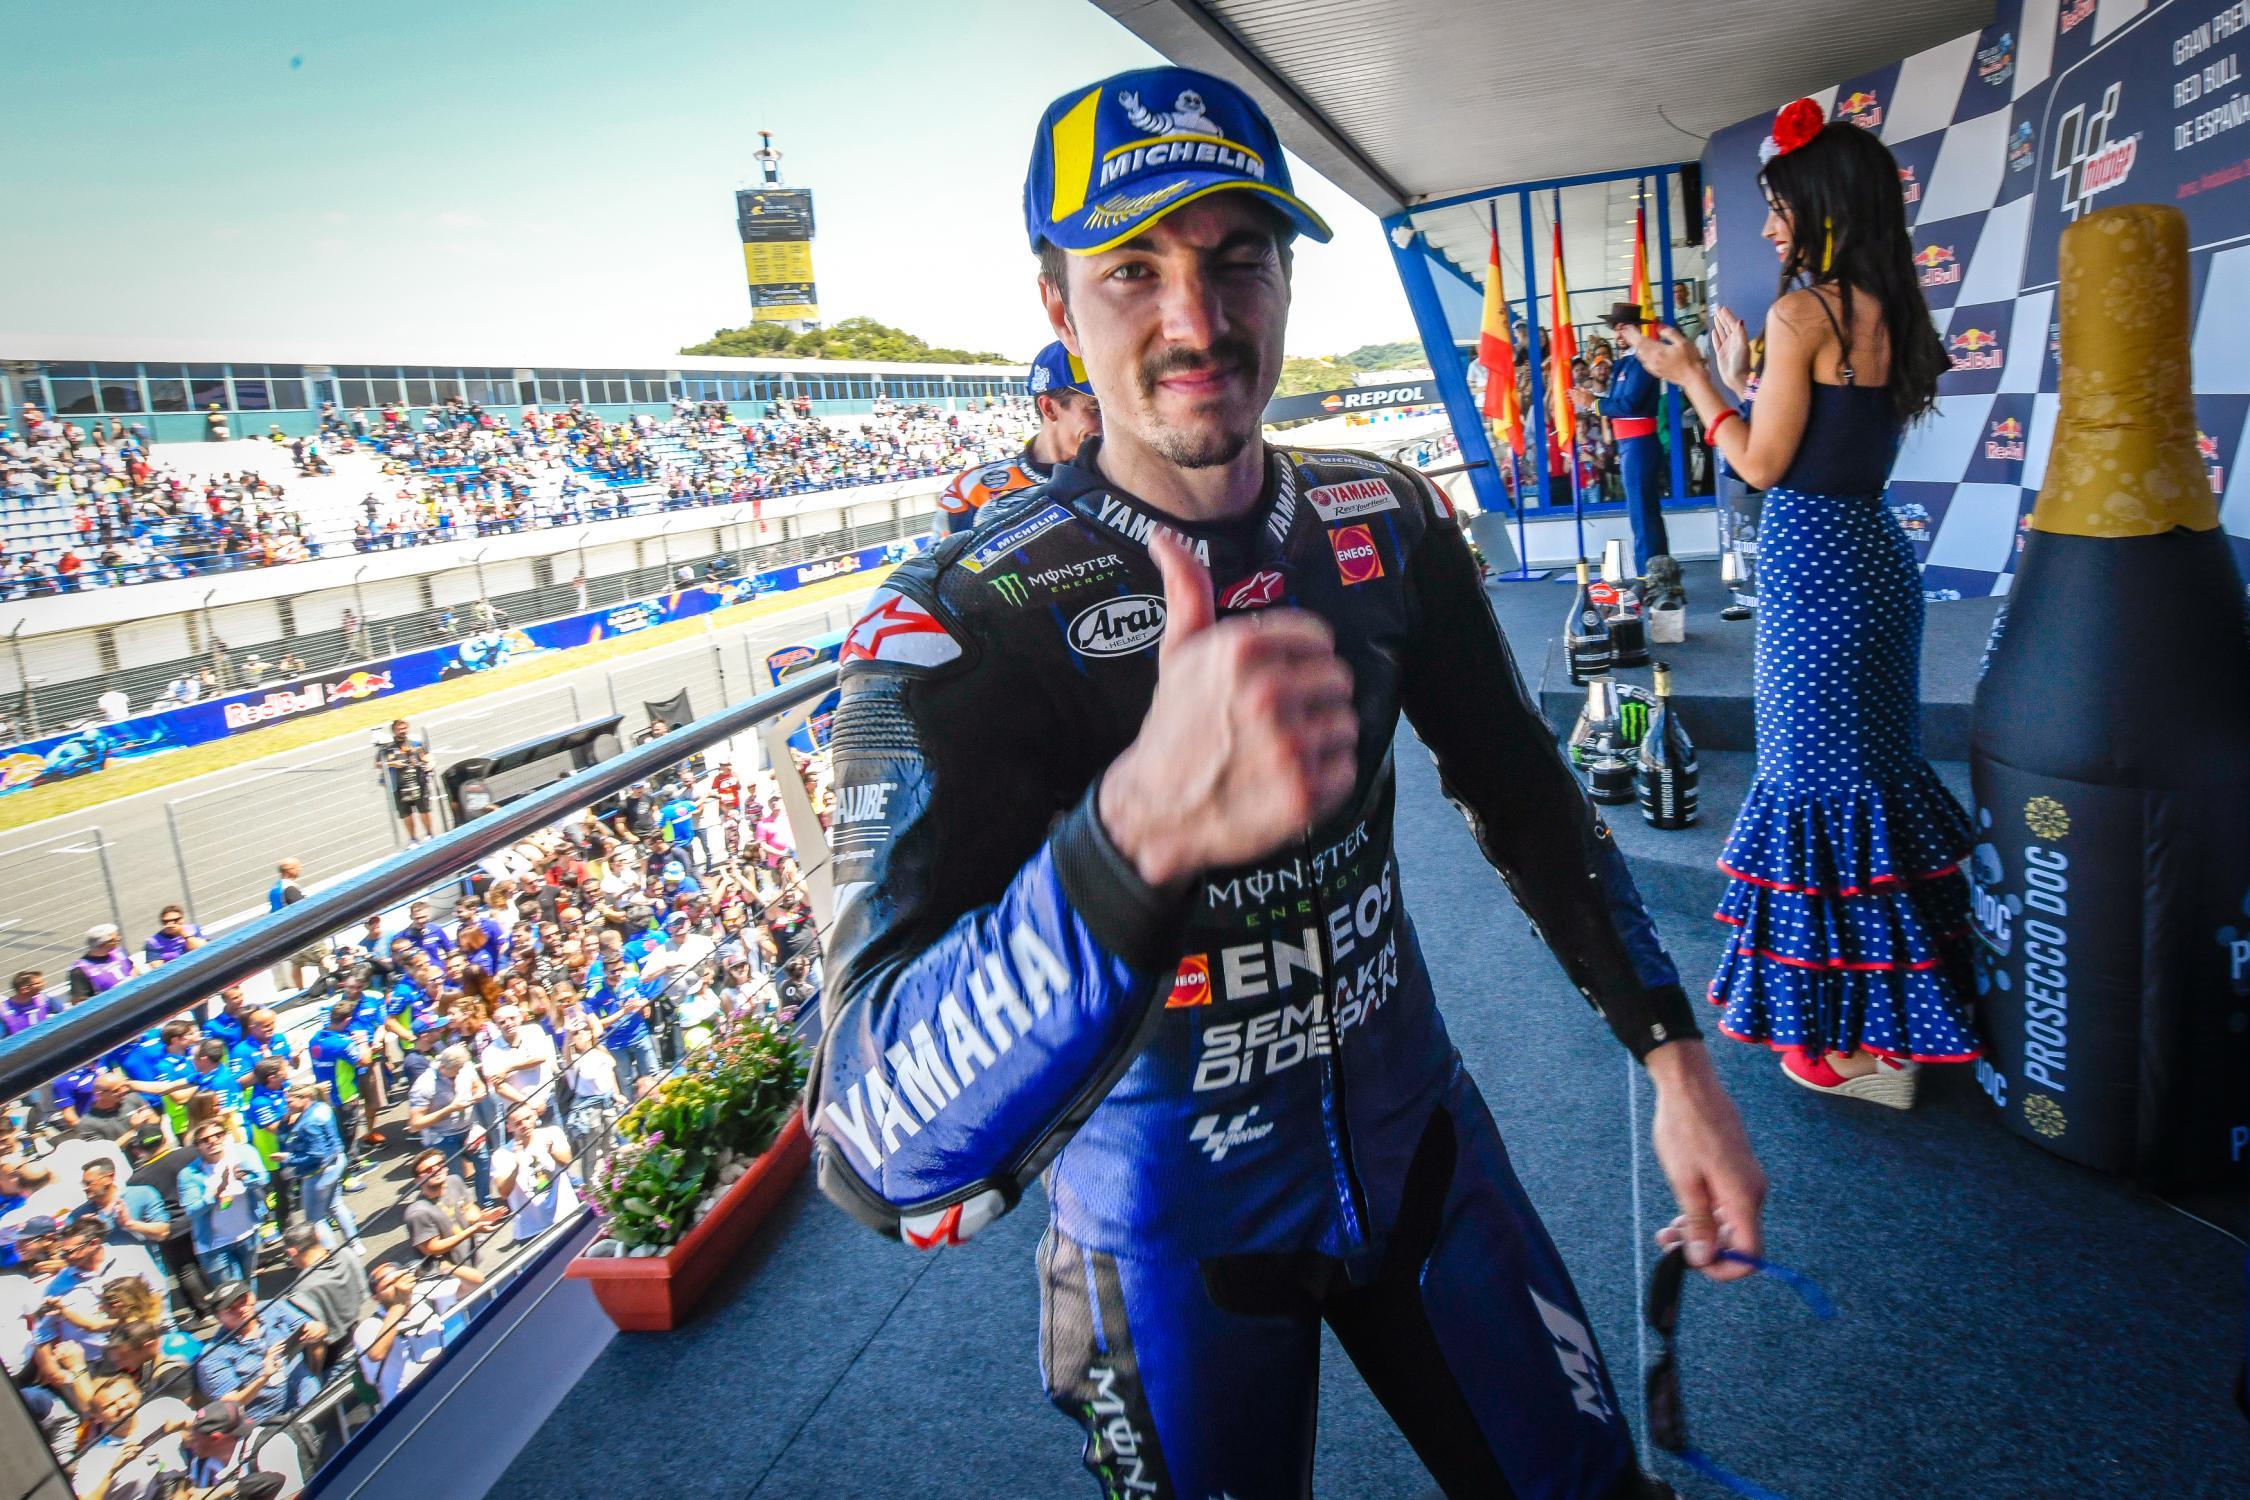 MOTO GP Grand Prix d'Espagne – Jerez  5 mai 2019  - Page 2 Maverick-vinales-jerez-podium-motogp-2019